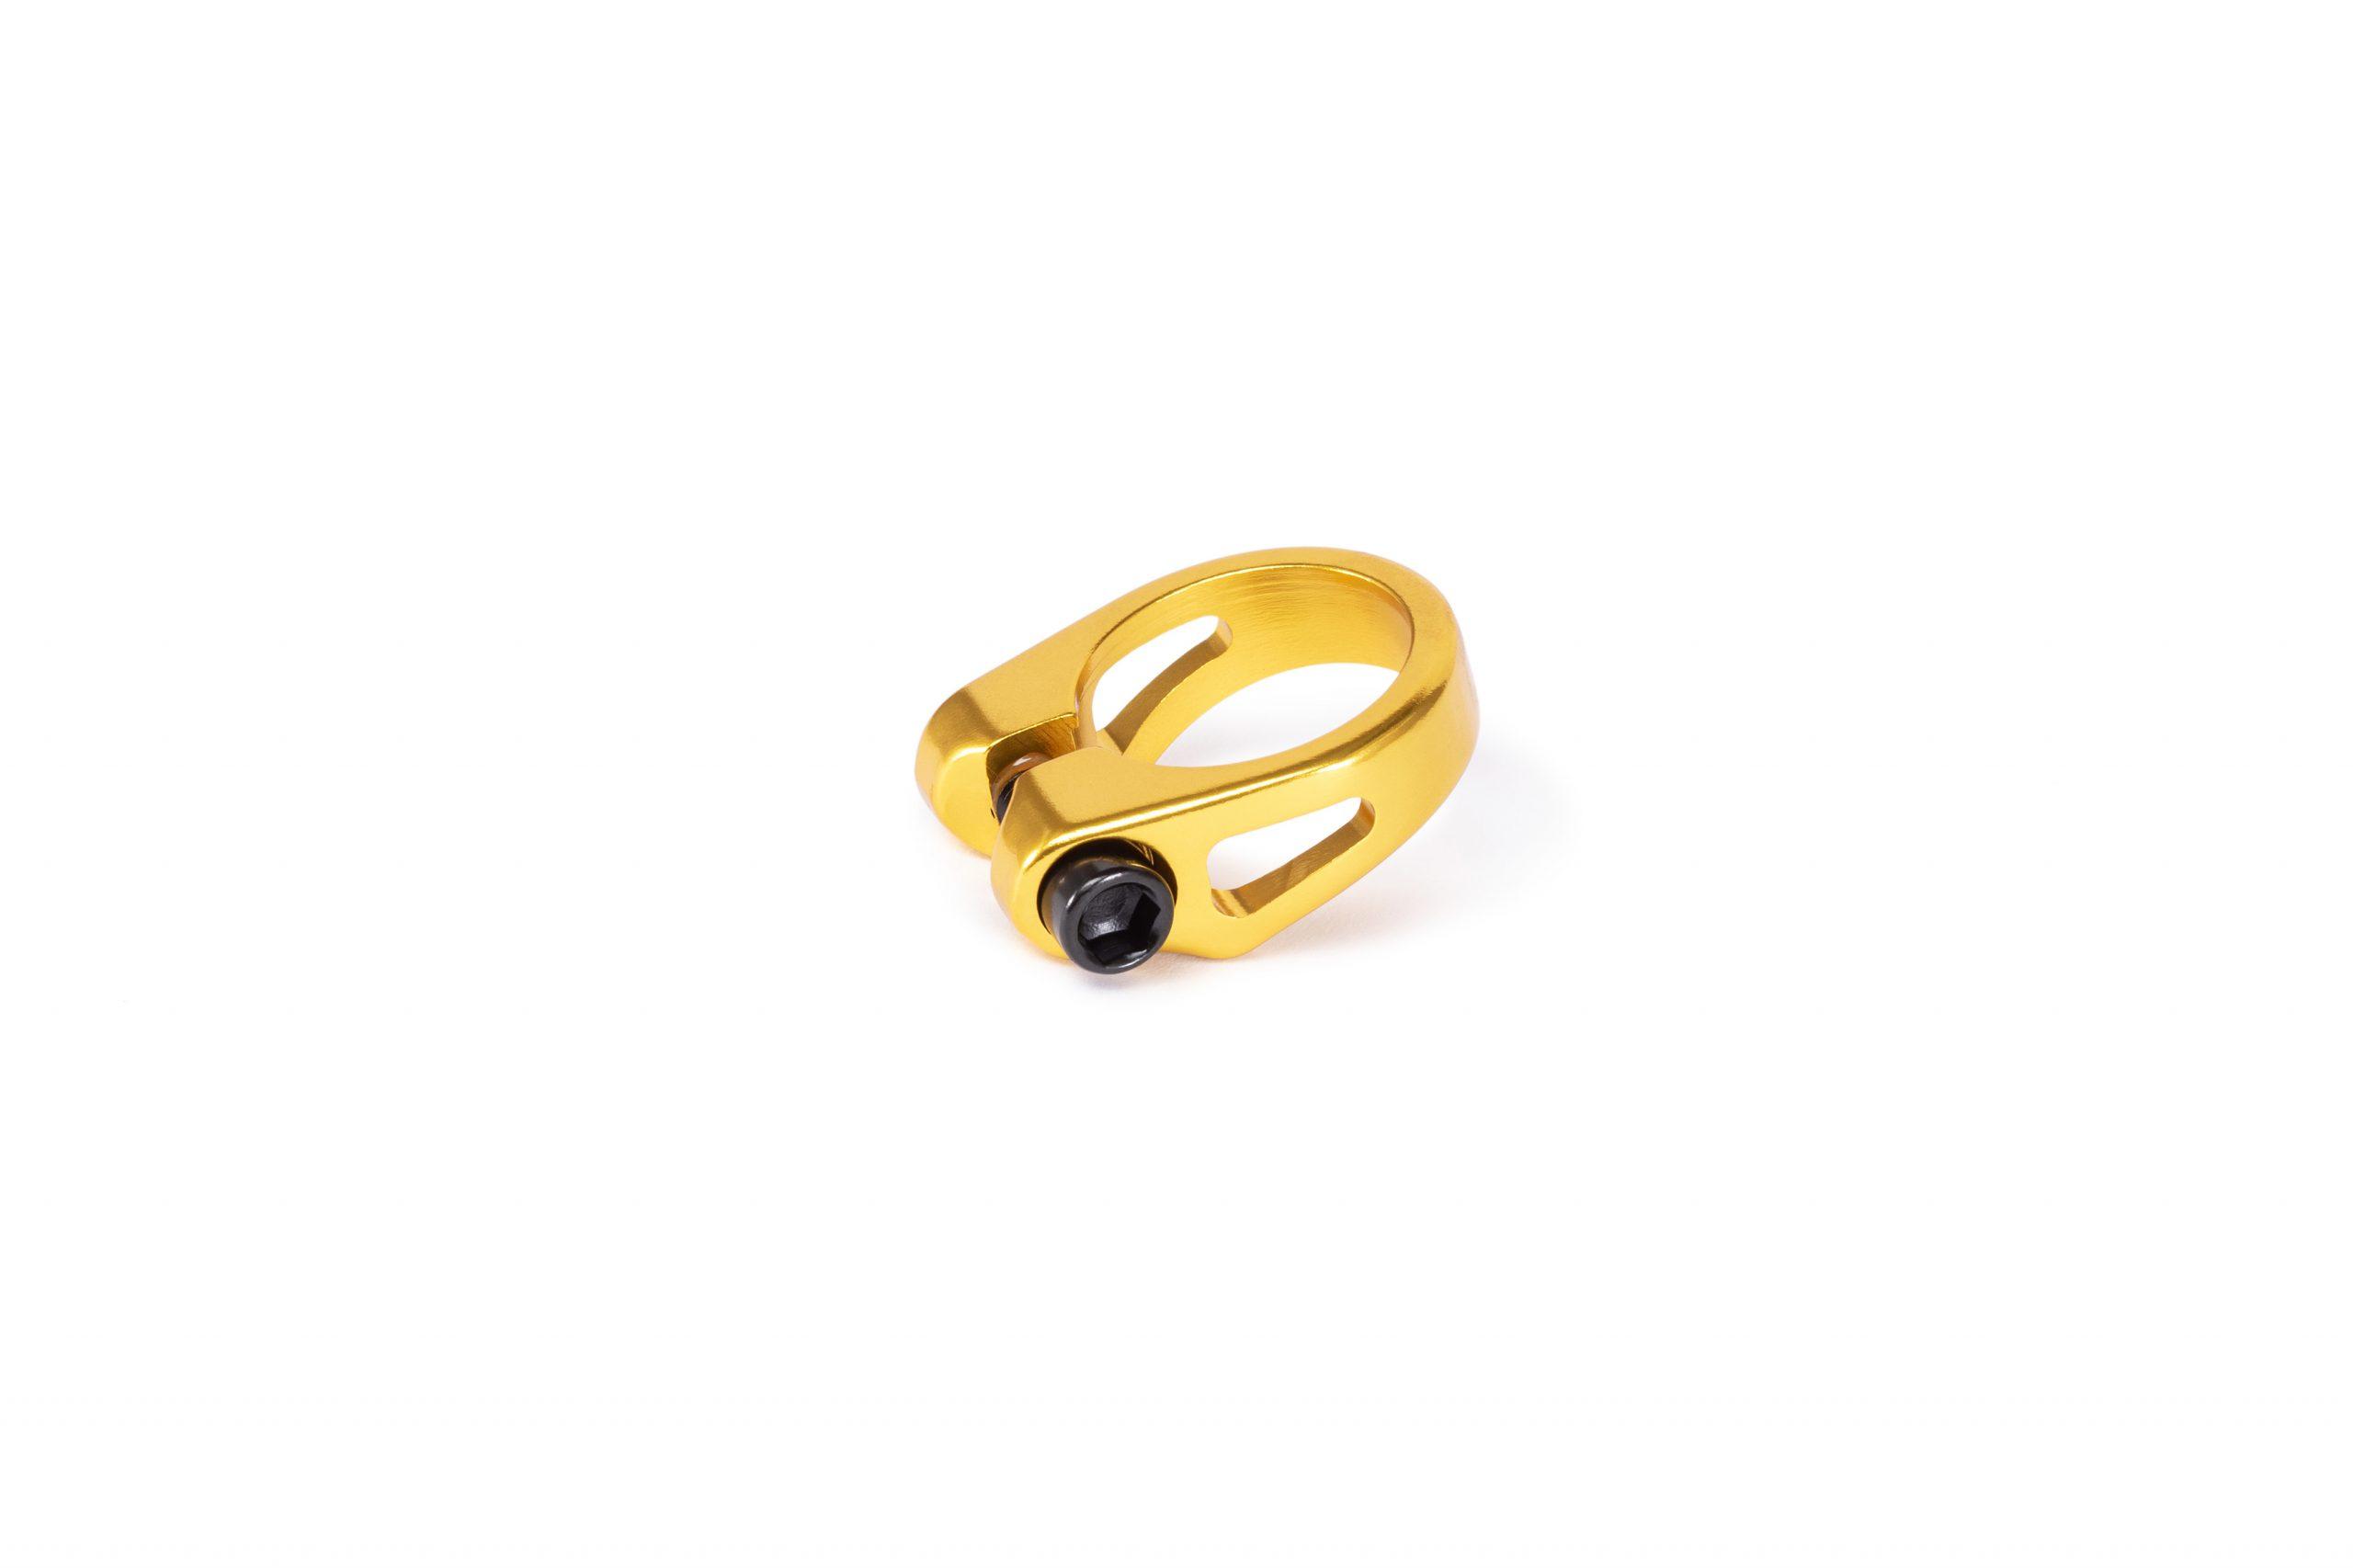 Salt_AM_seat_clamp_gold-02